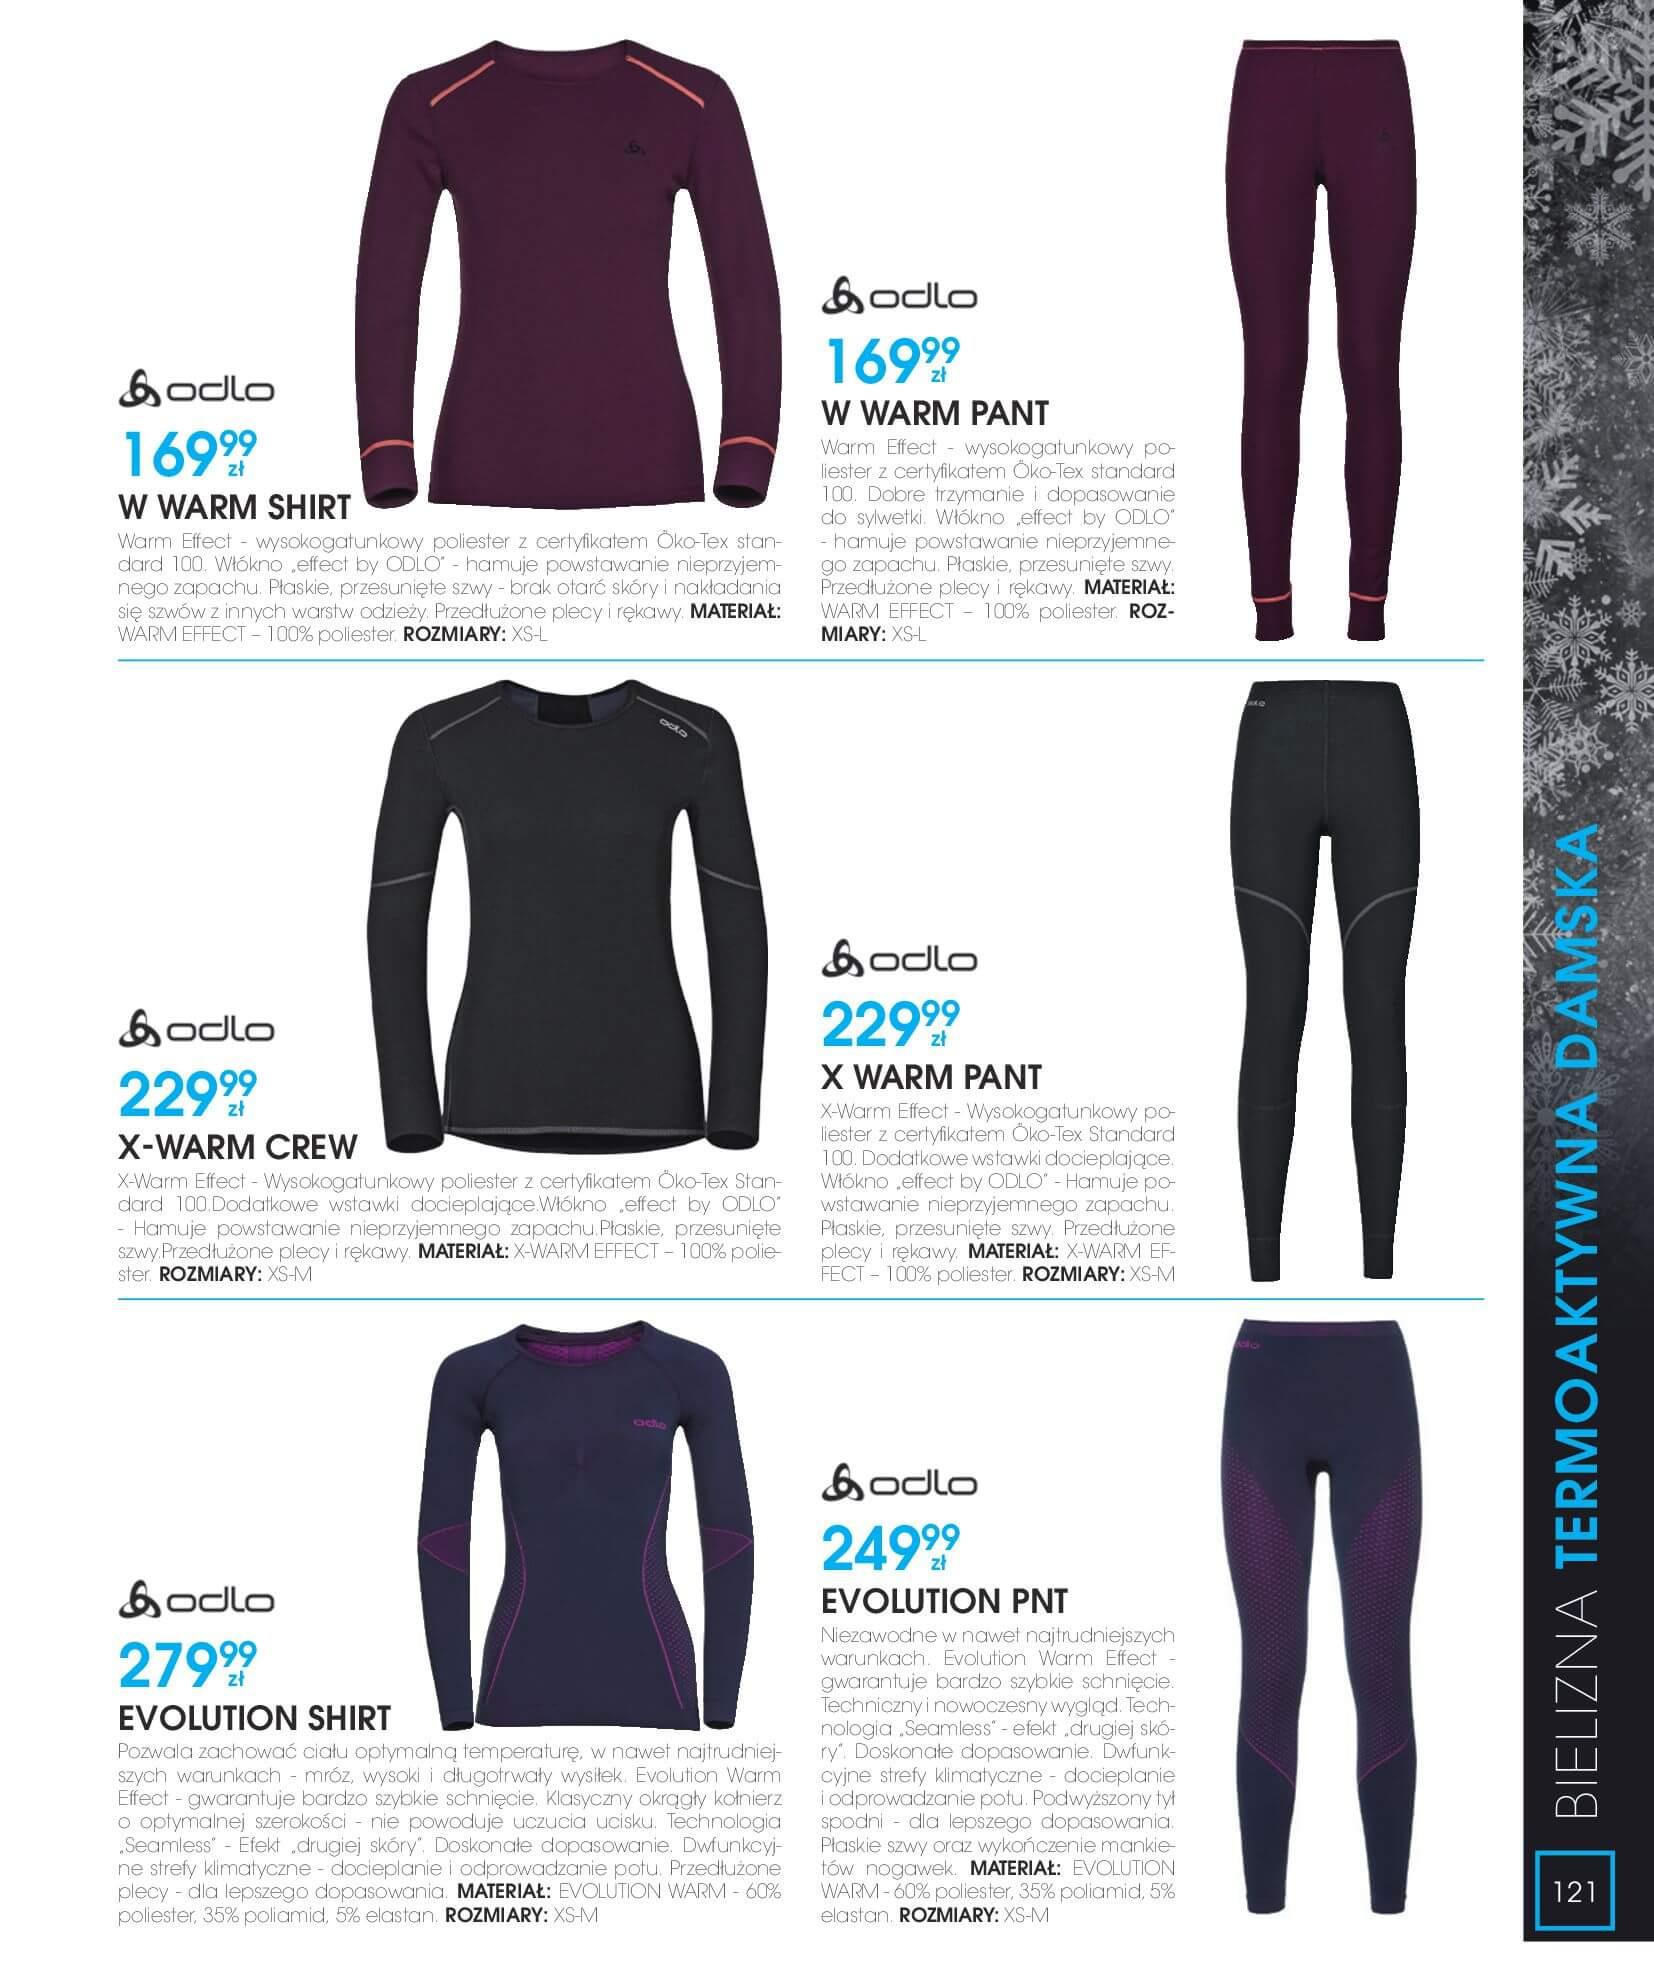 Gazetka Go Sport - Katalog Zima 2017/2018-12.11.2017-28.02.2018-page-121